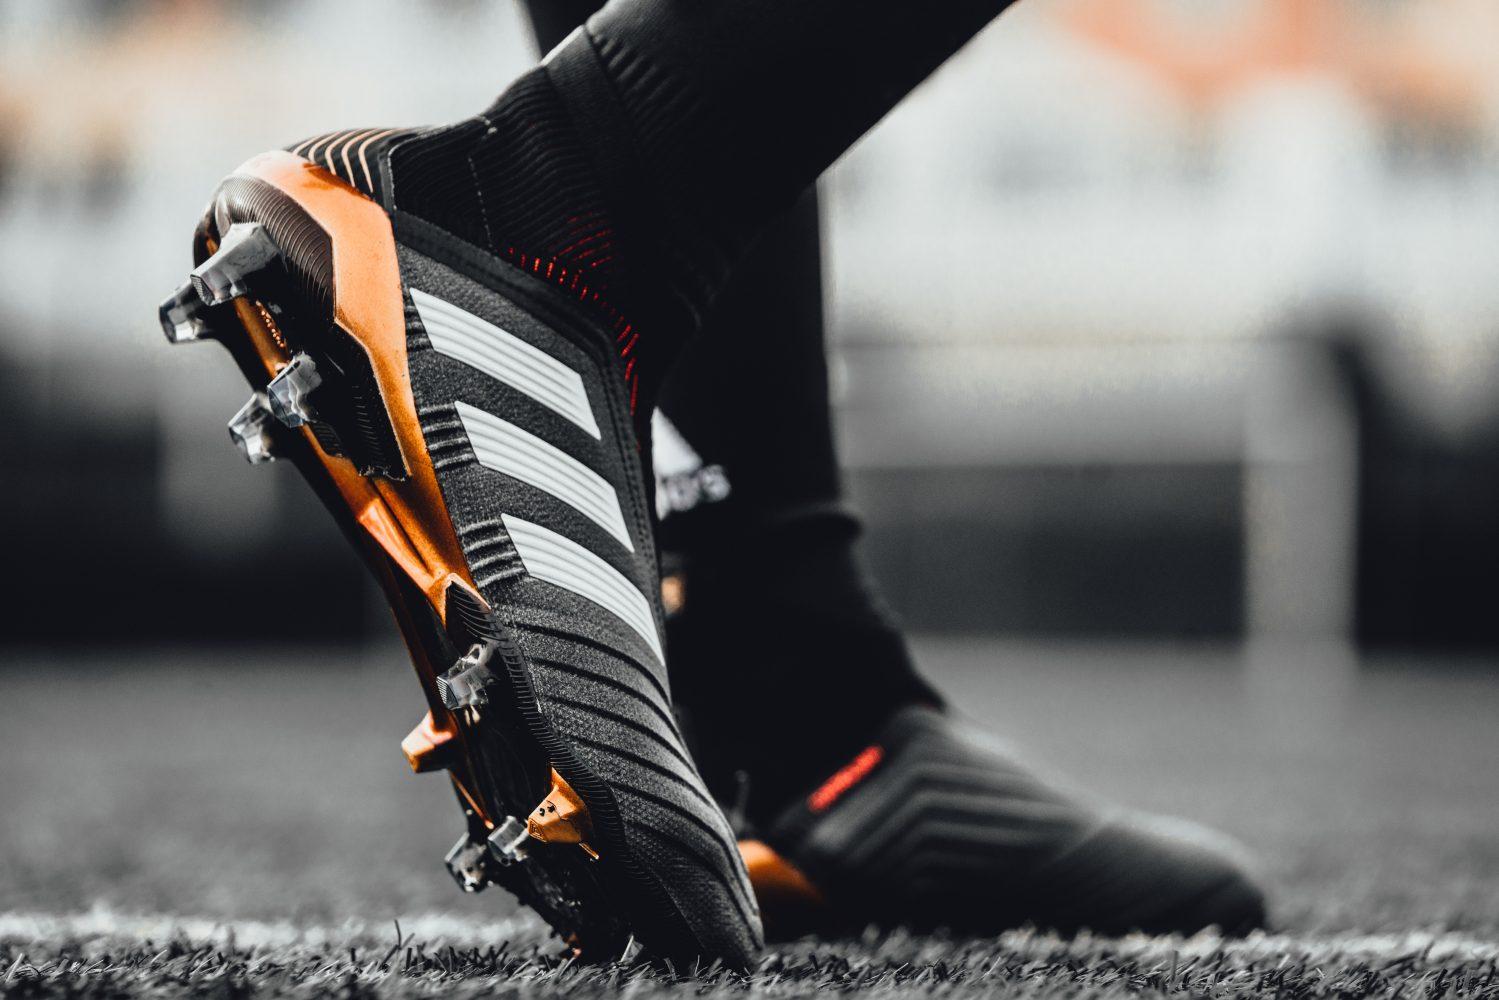 Introducing the adidas Predator 18+